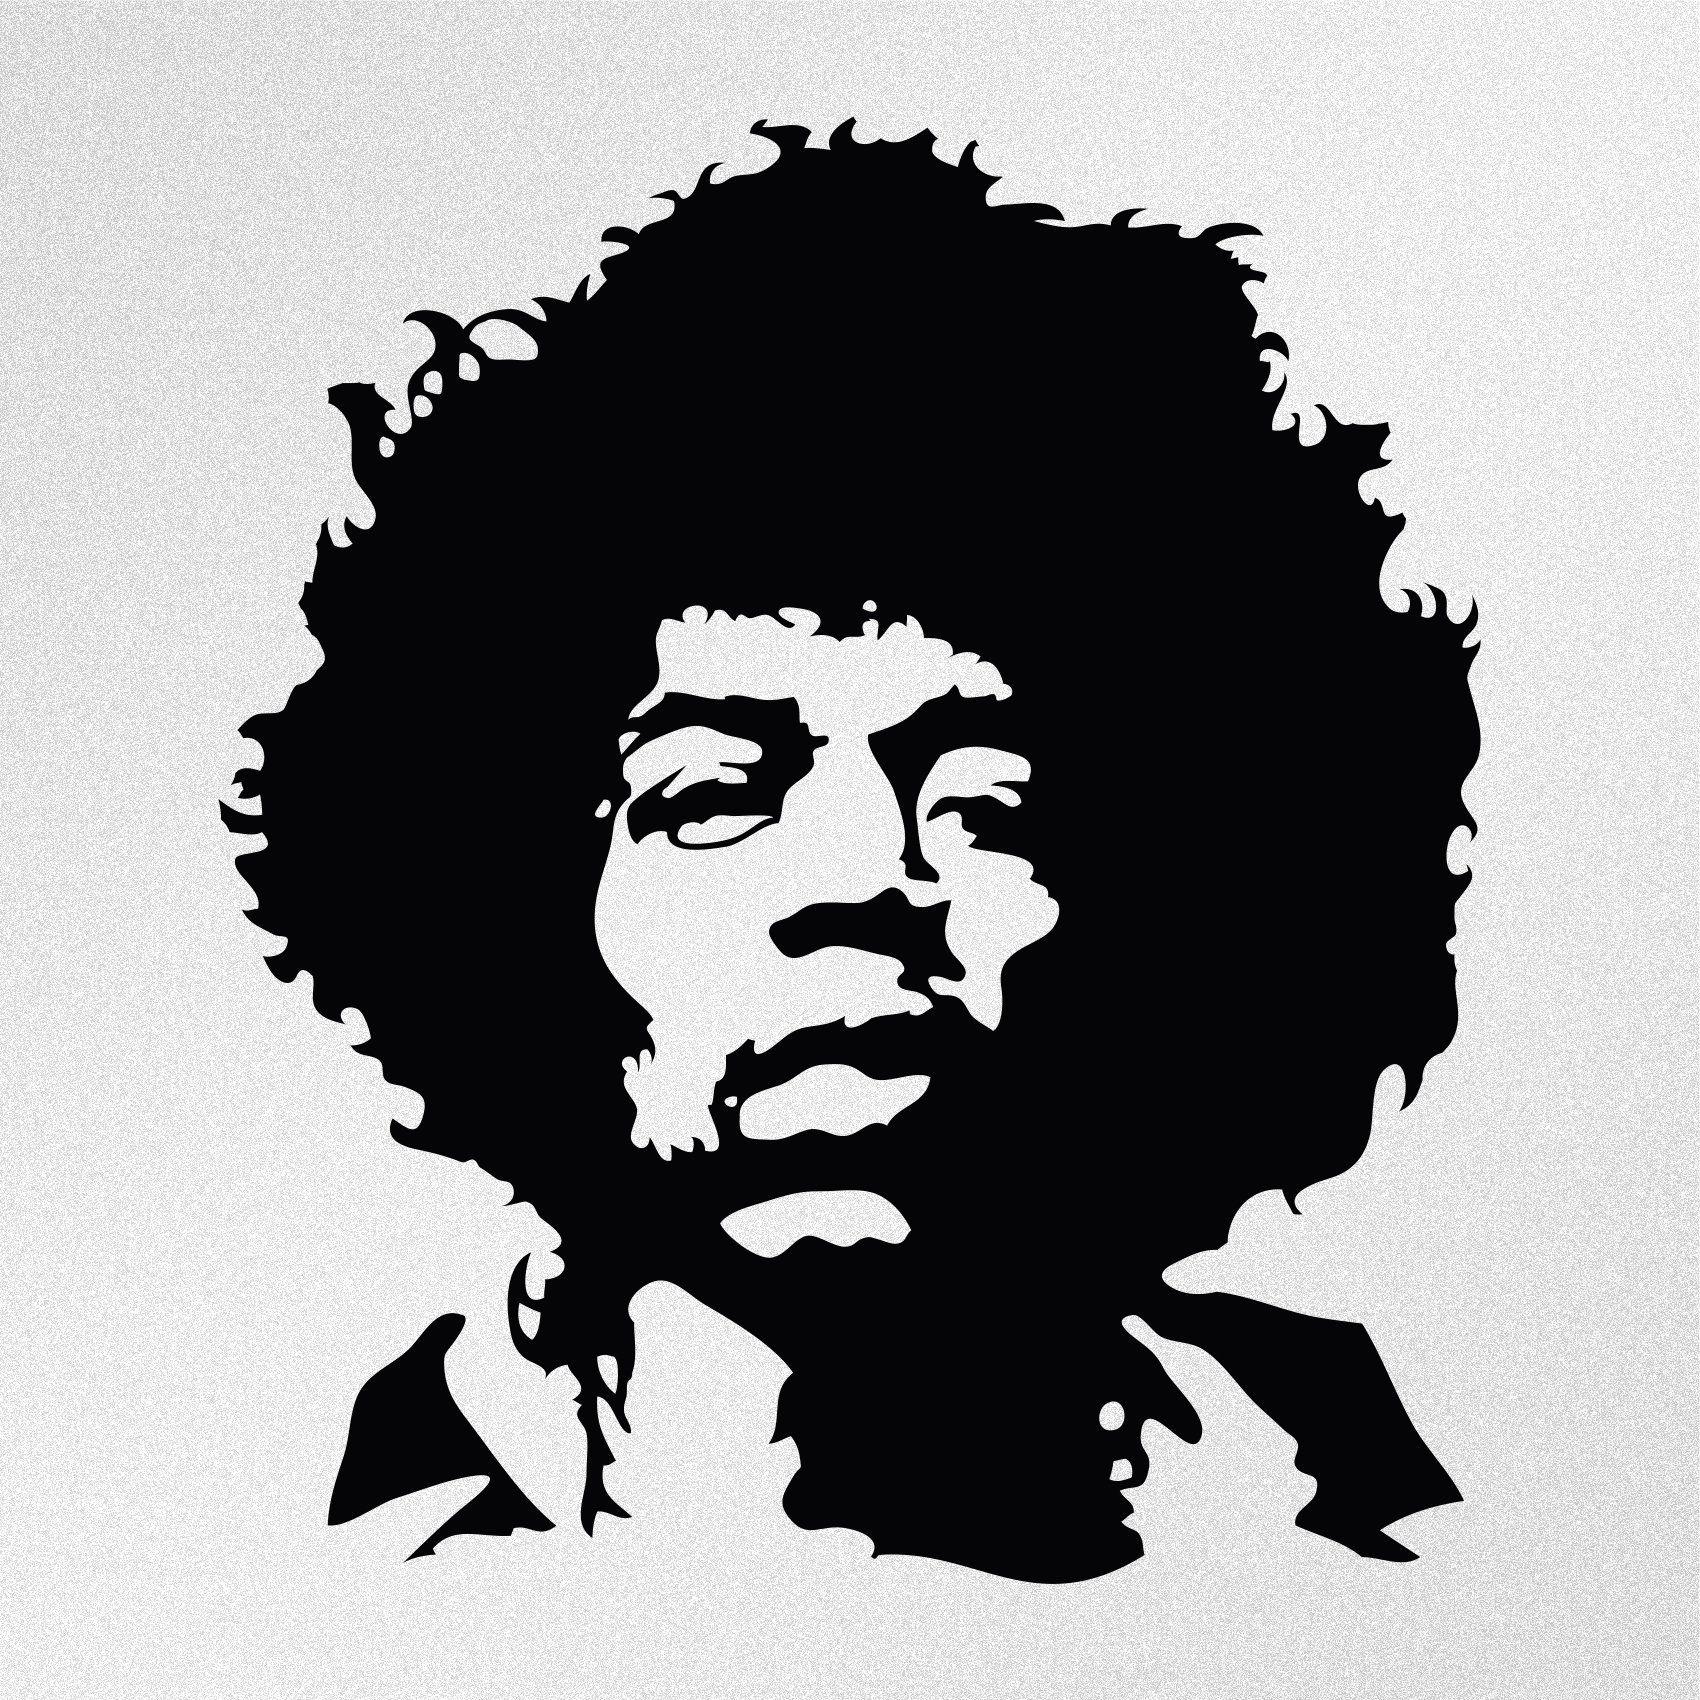 Jimi Hendrix Portrait Vinyl Decal Sticker Etsy Jimi Hendrix Art Jimi Hendrix Jimi Hendrix Tattoo [ 1700 x 1700 Pixel ]